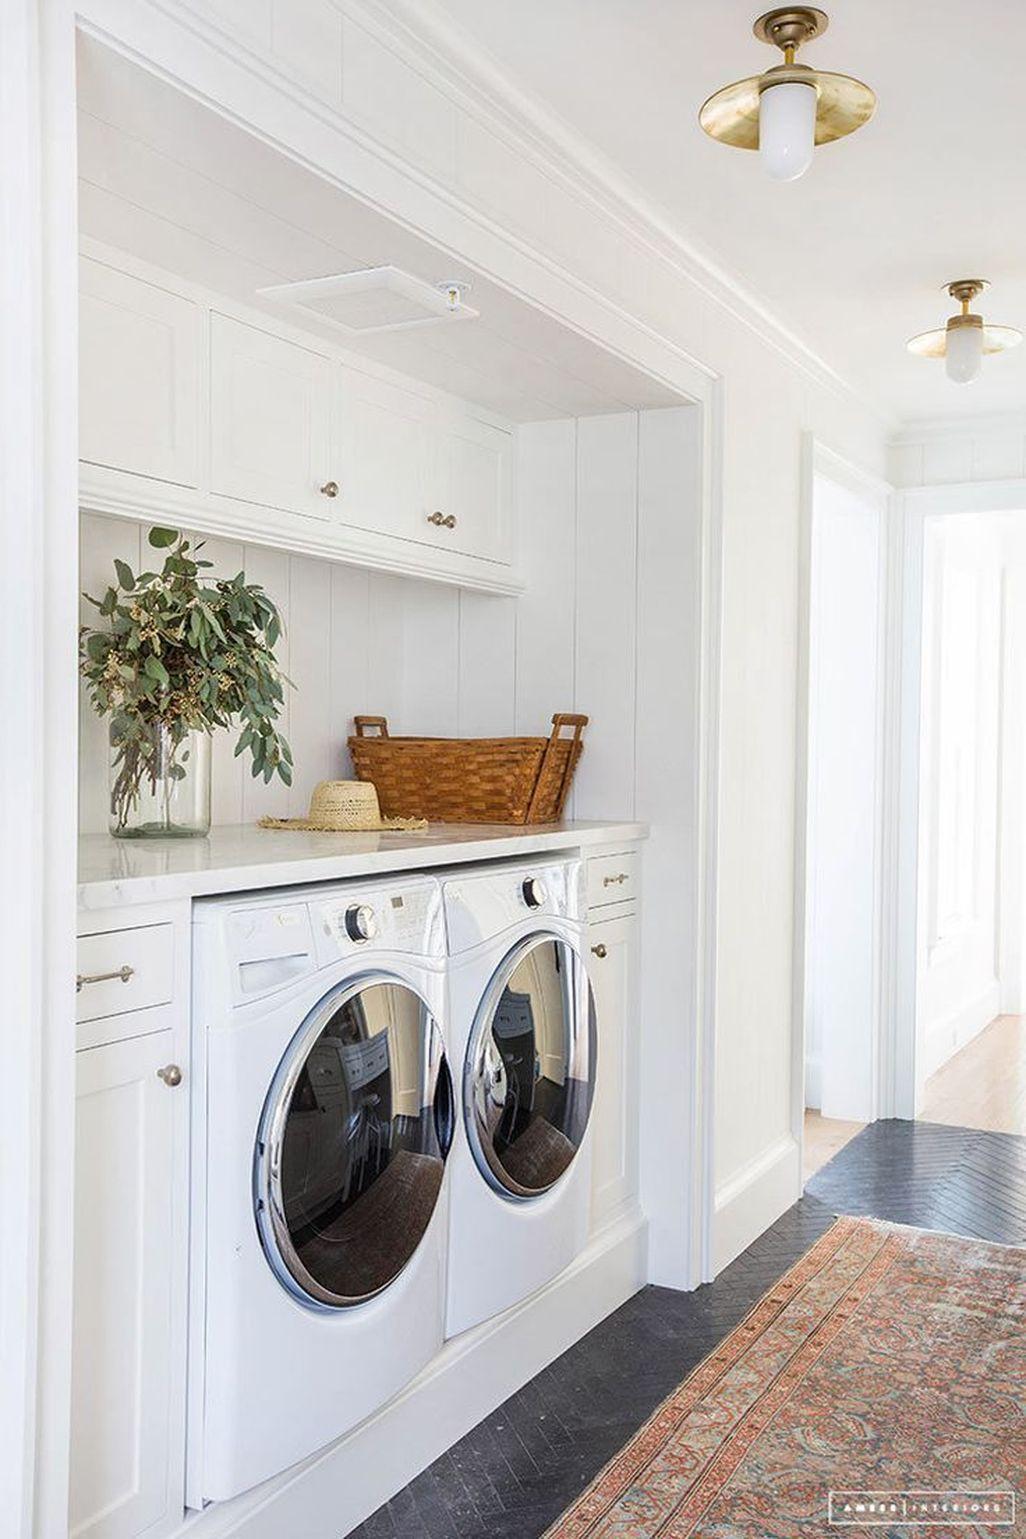 Modern Basement Remodel Laundry Room Ideas 32